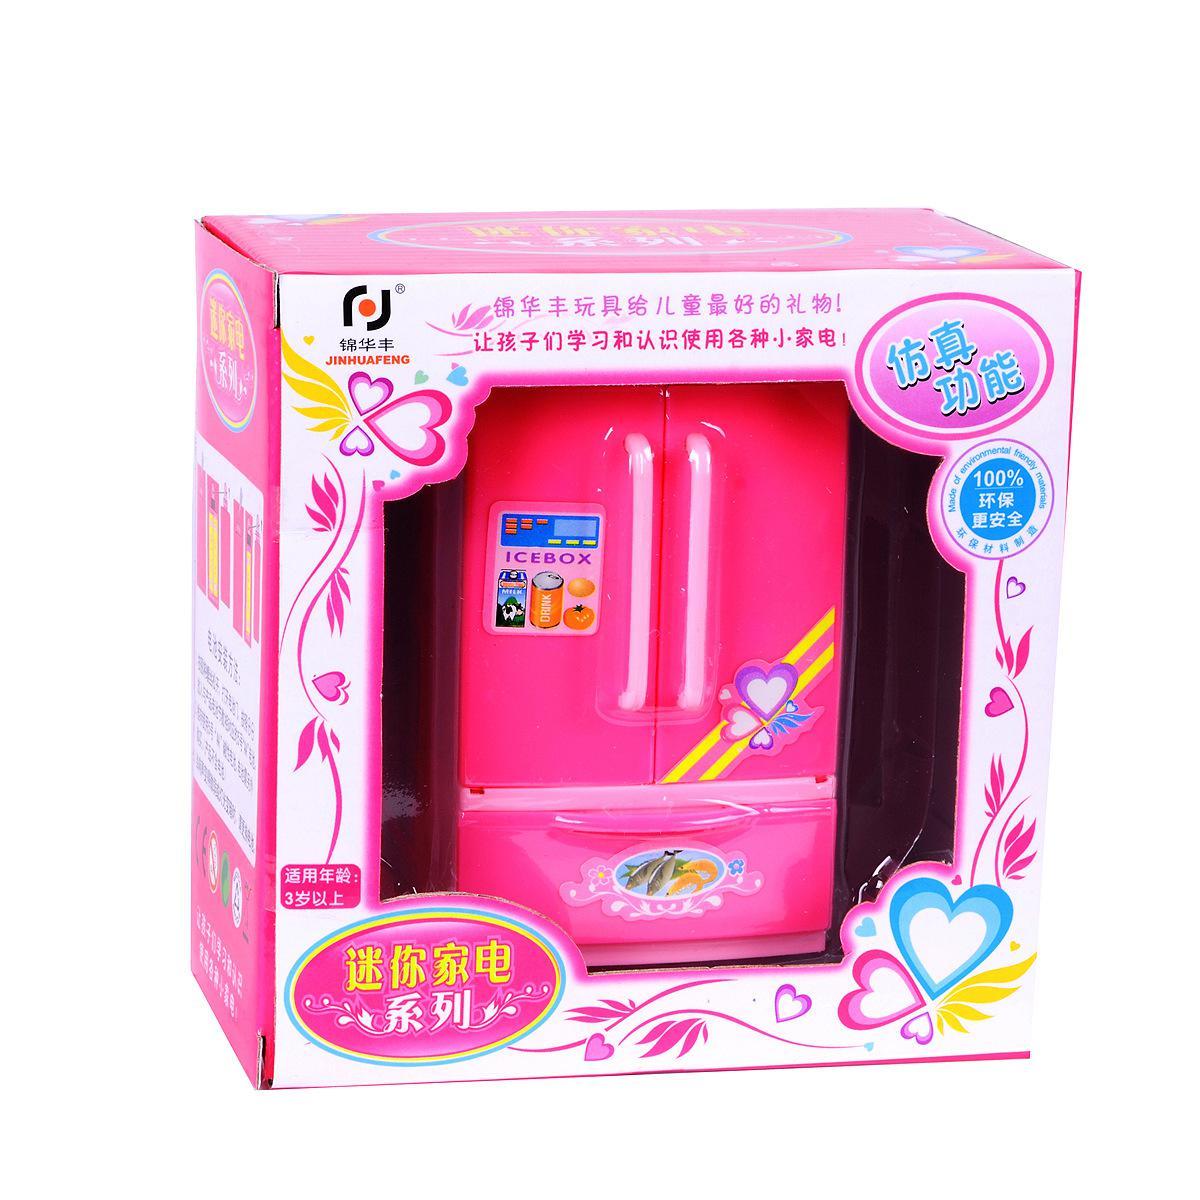 Toys Refrigerator 74